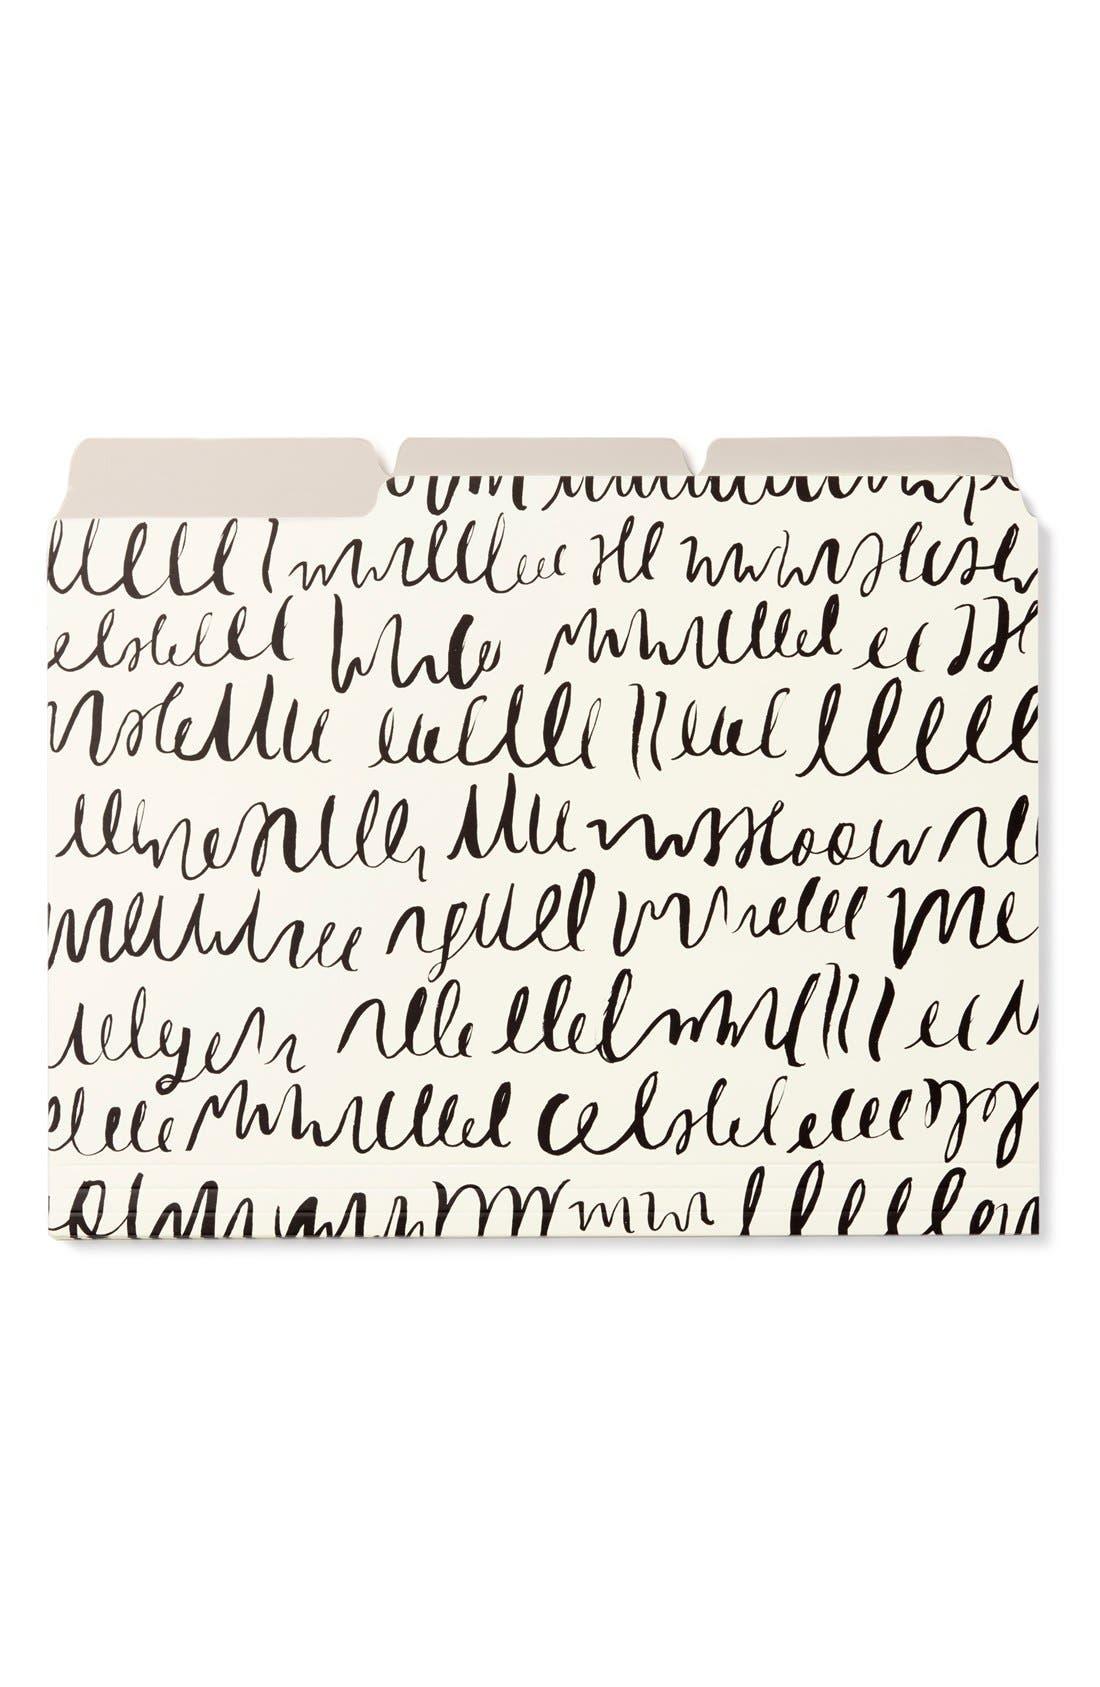 kate spade new york 'hidden meaning' file folder (Set of 6)